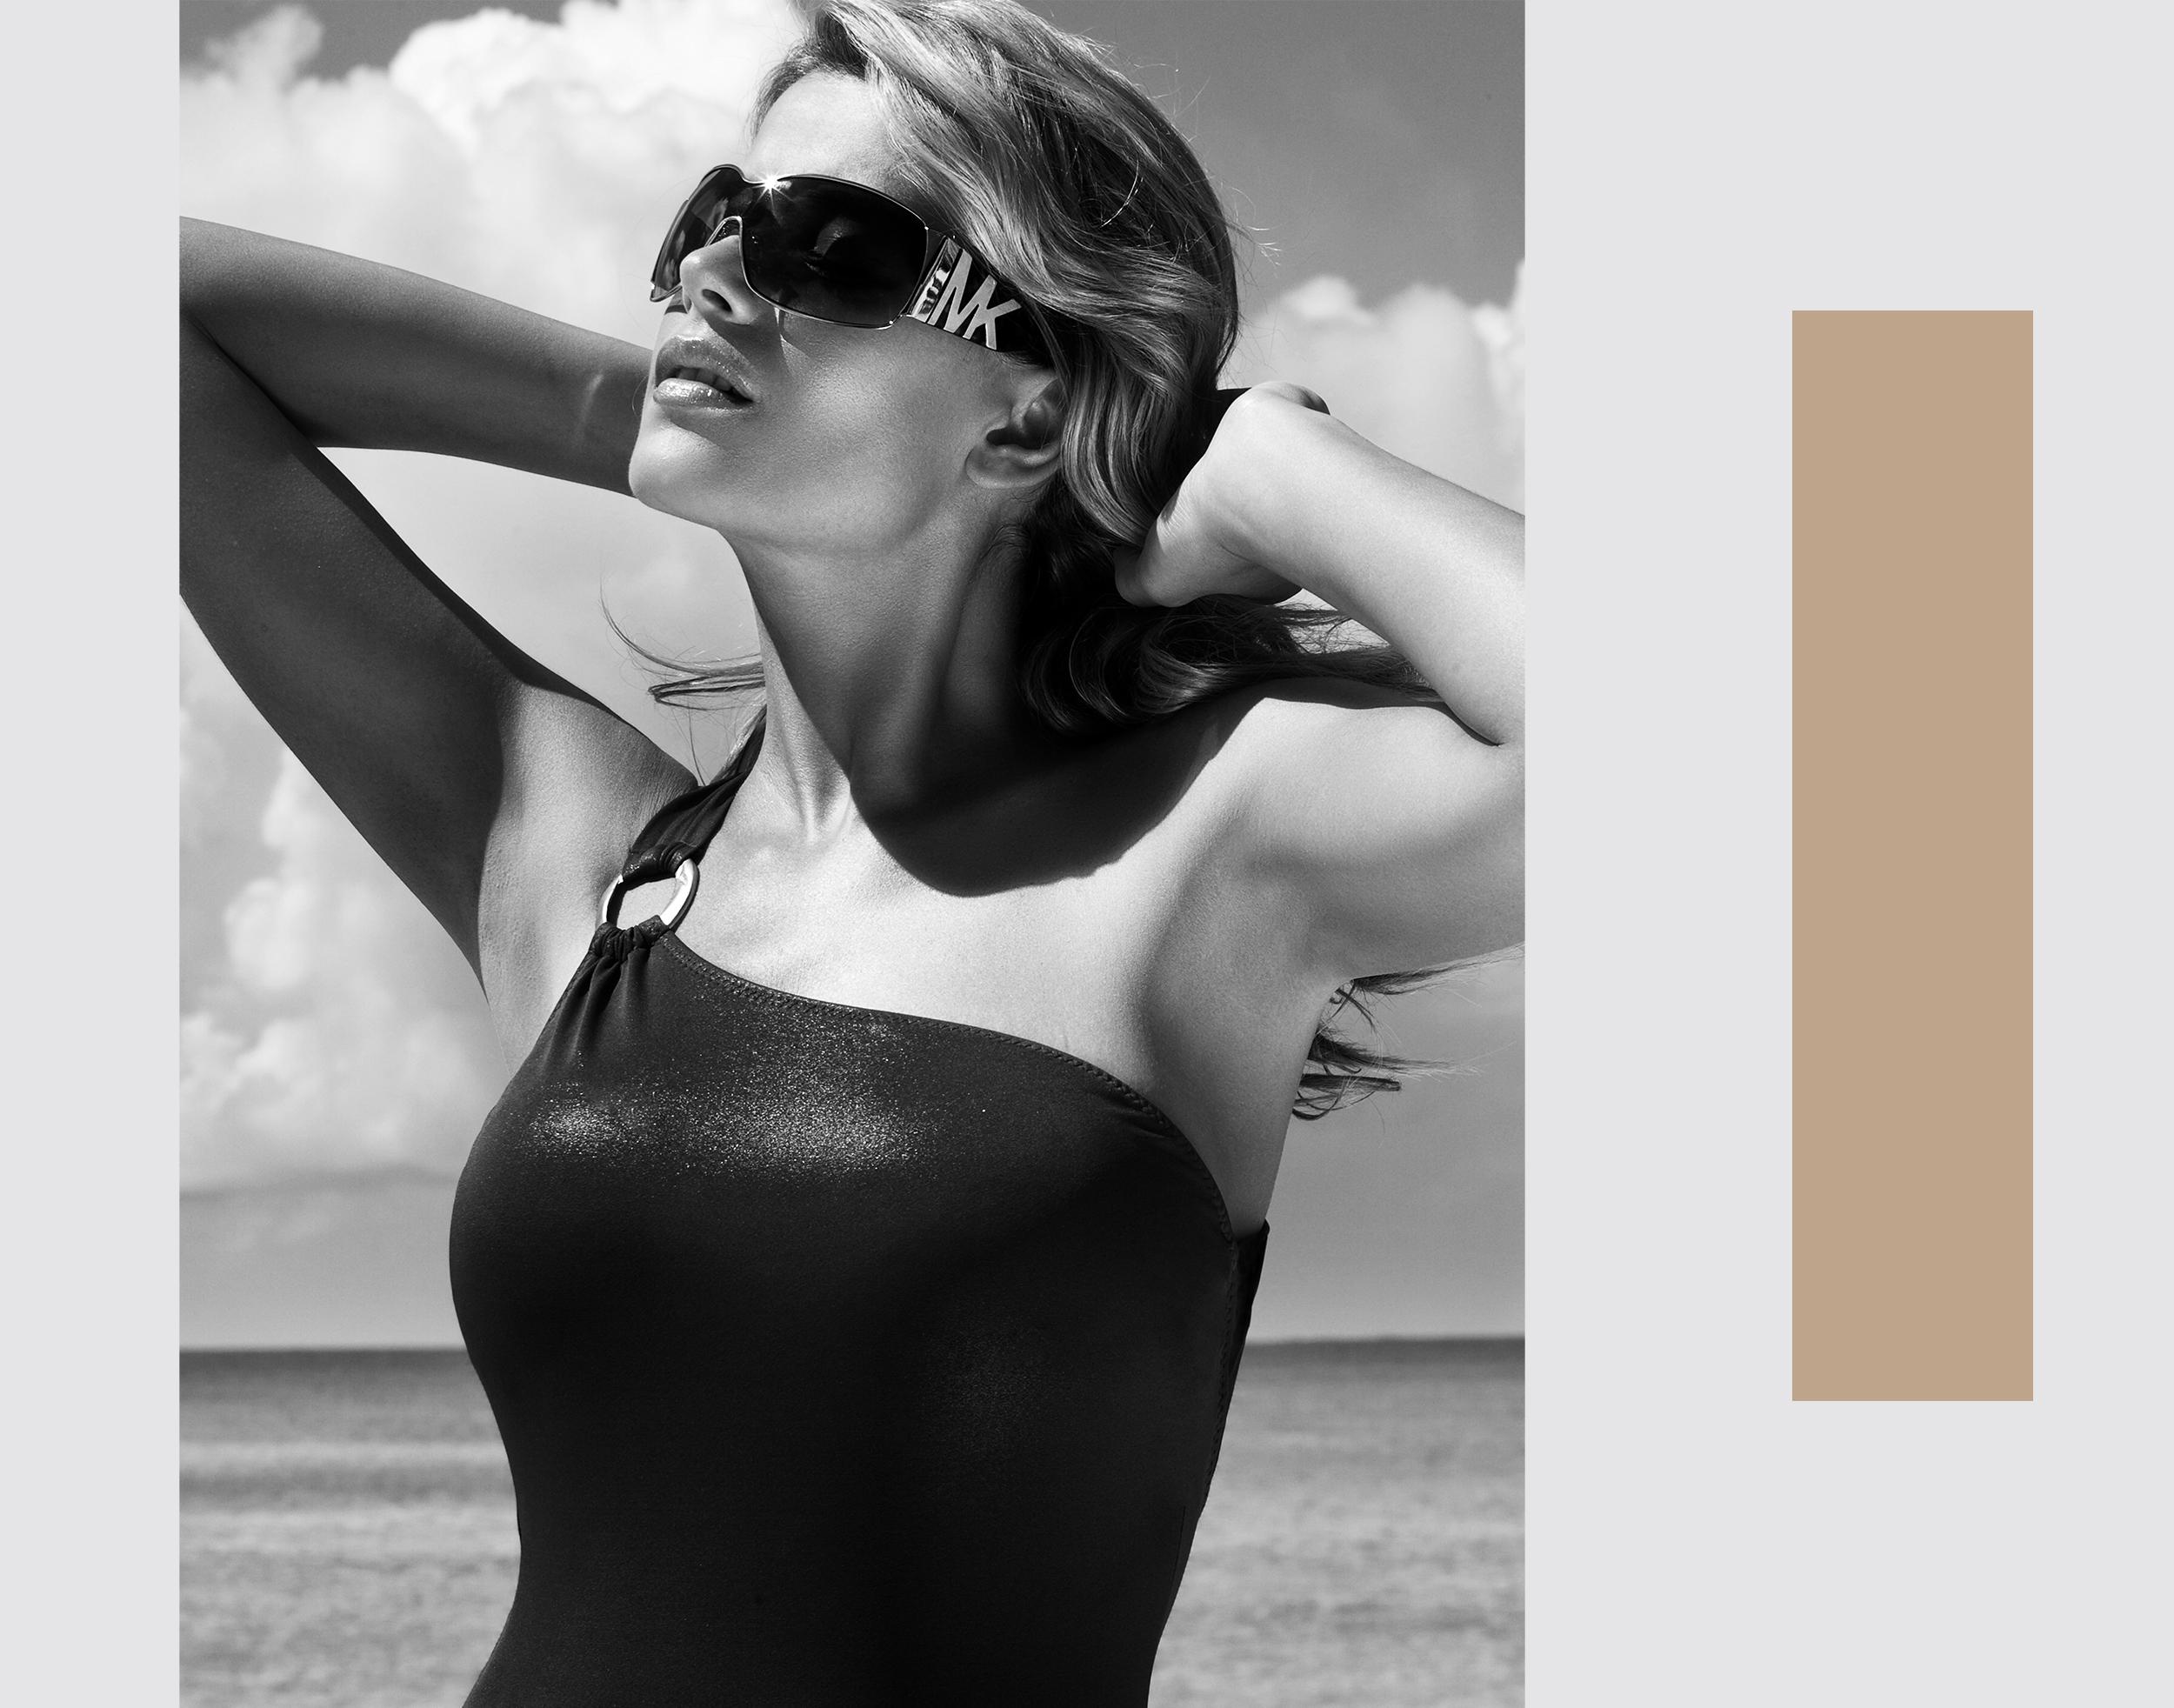 Advertising_Fashion_Swim_05.jpg